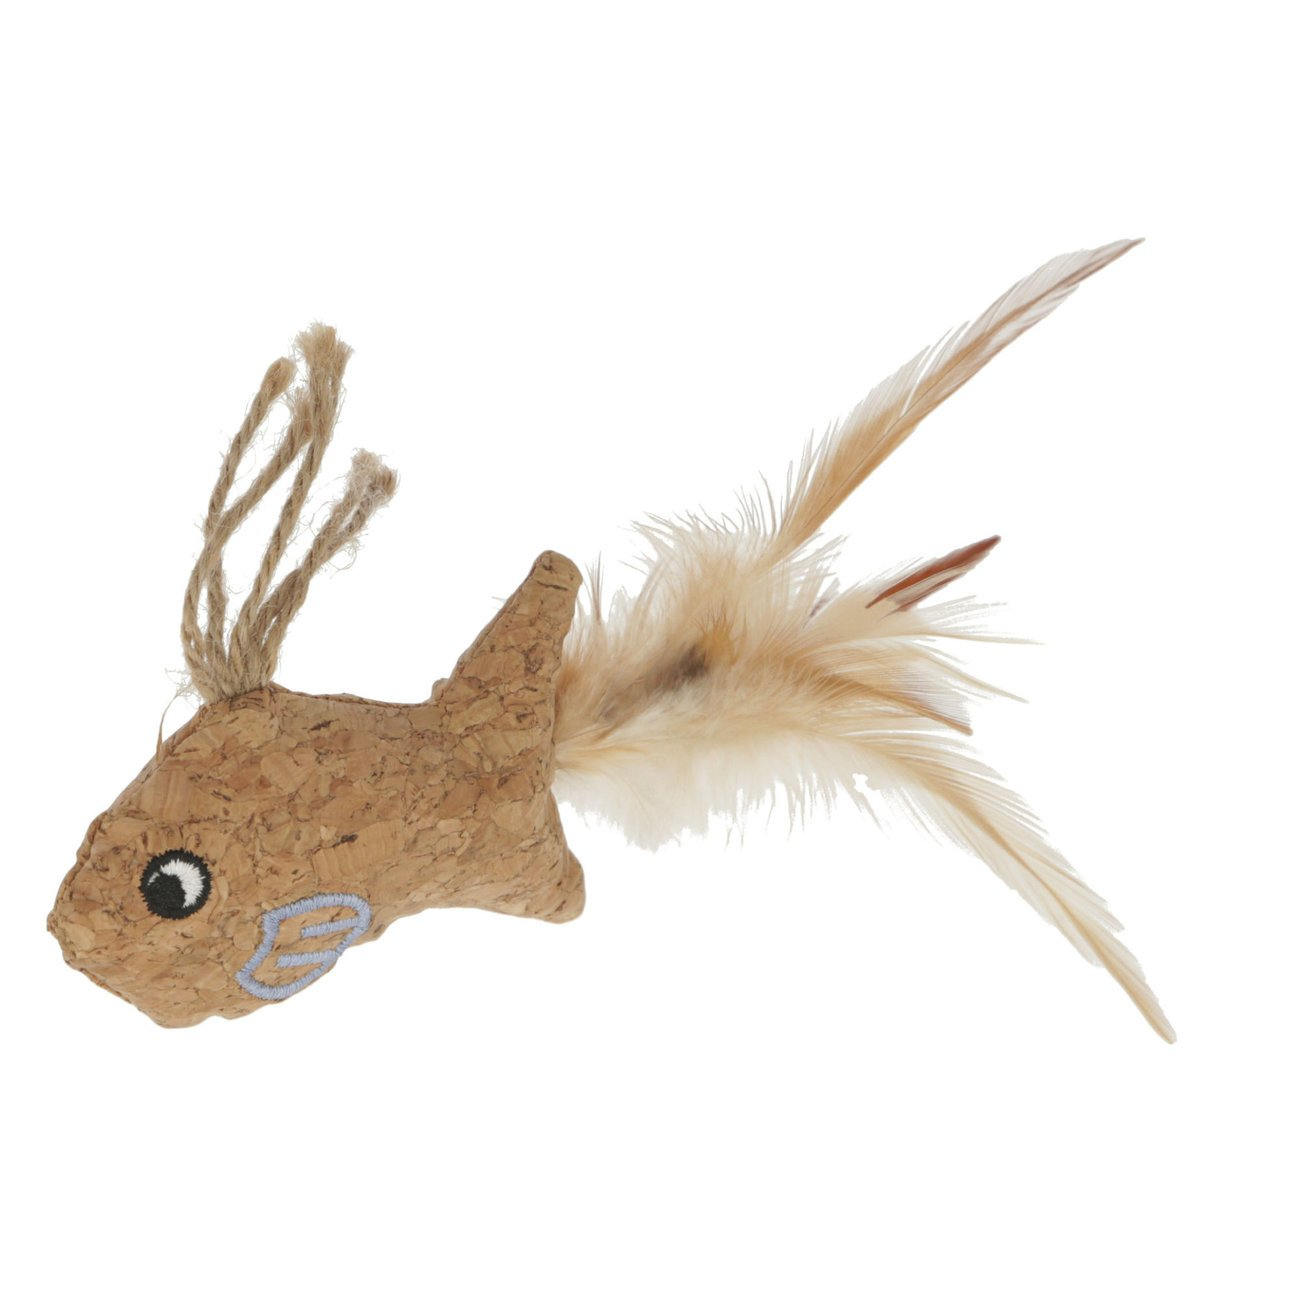 Kerbl Katzenspielzeug Kork, Fisch 21 x 10 cm